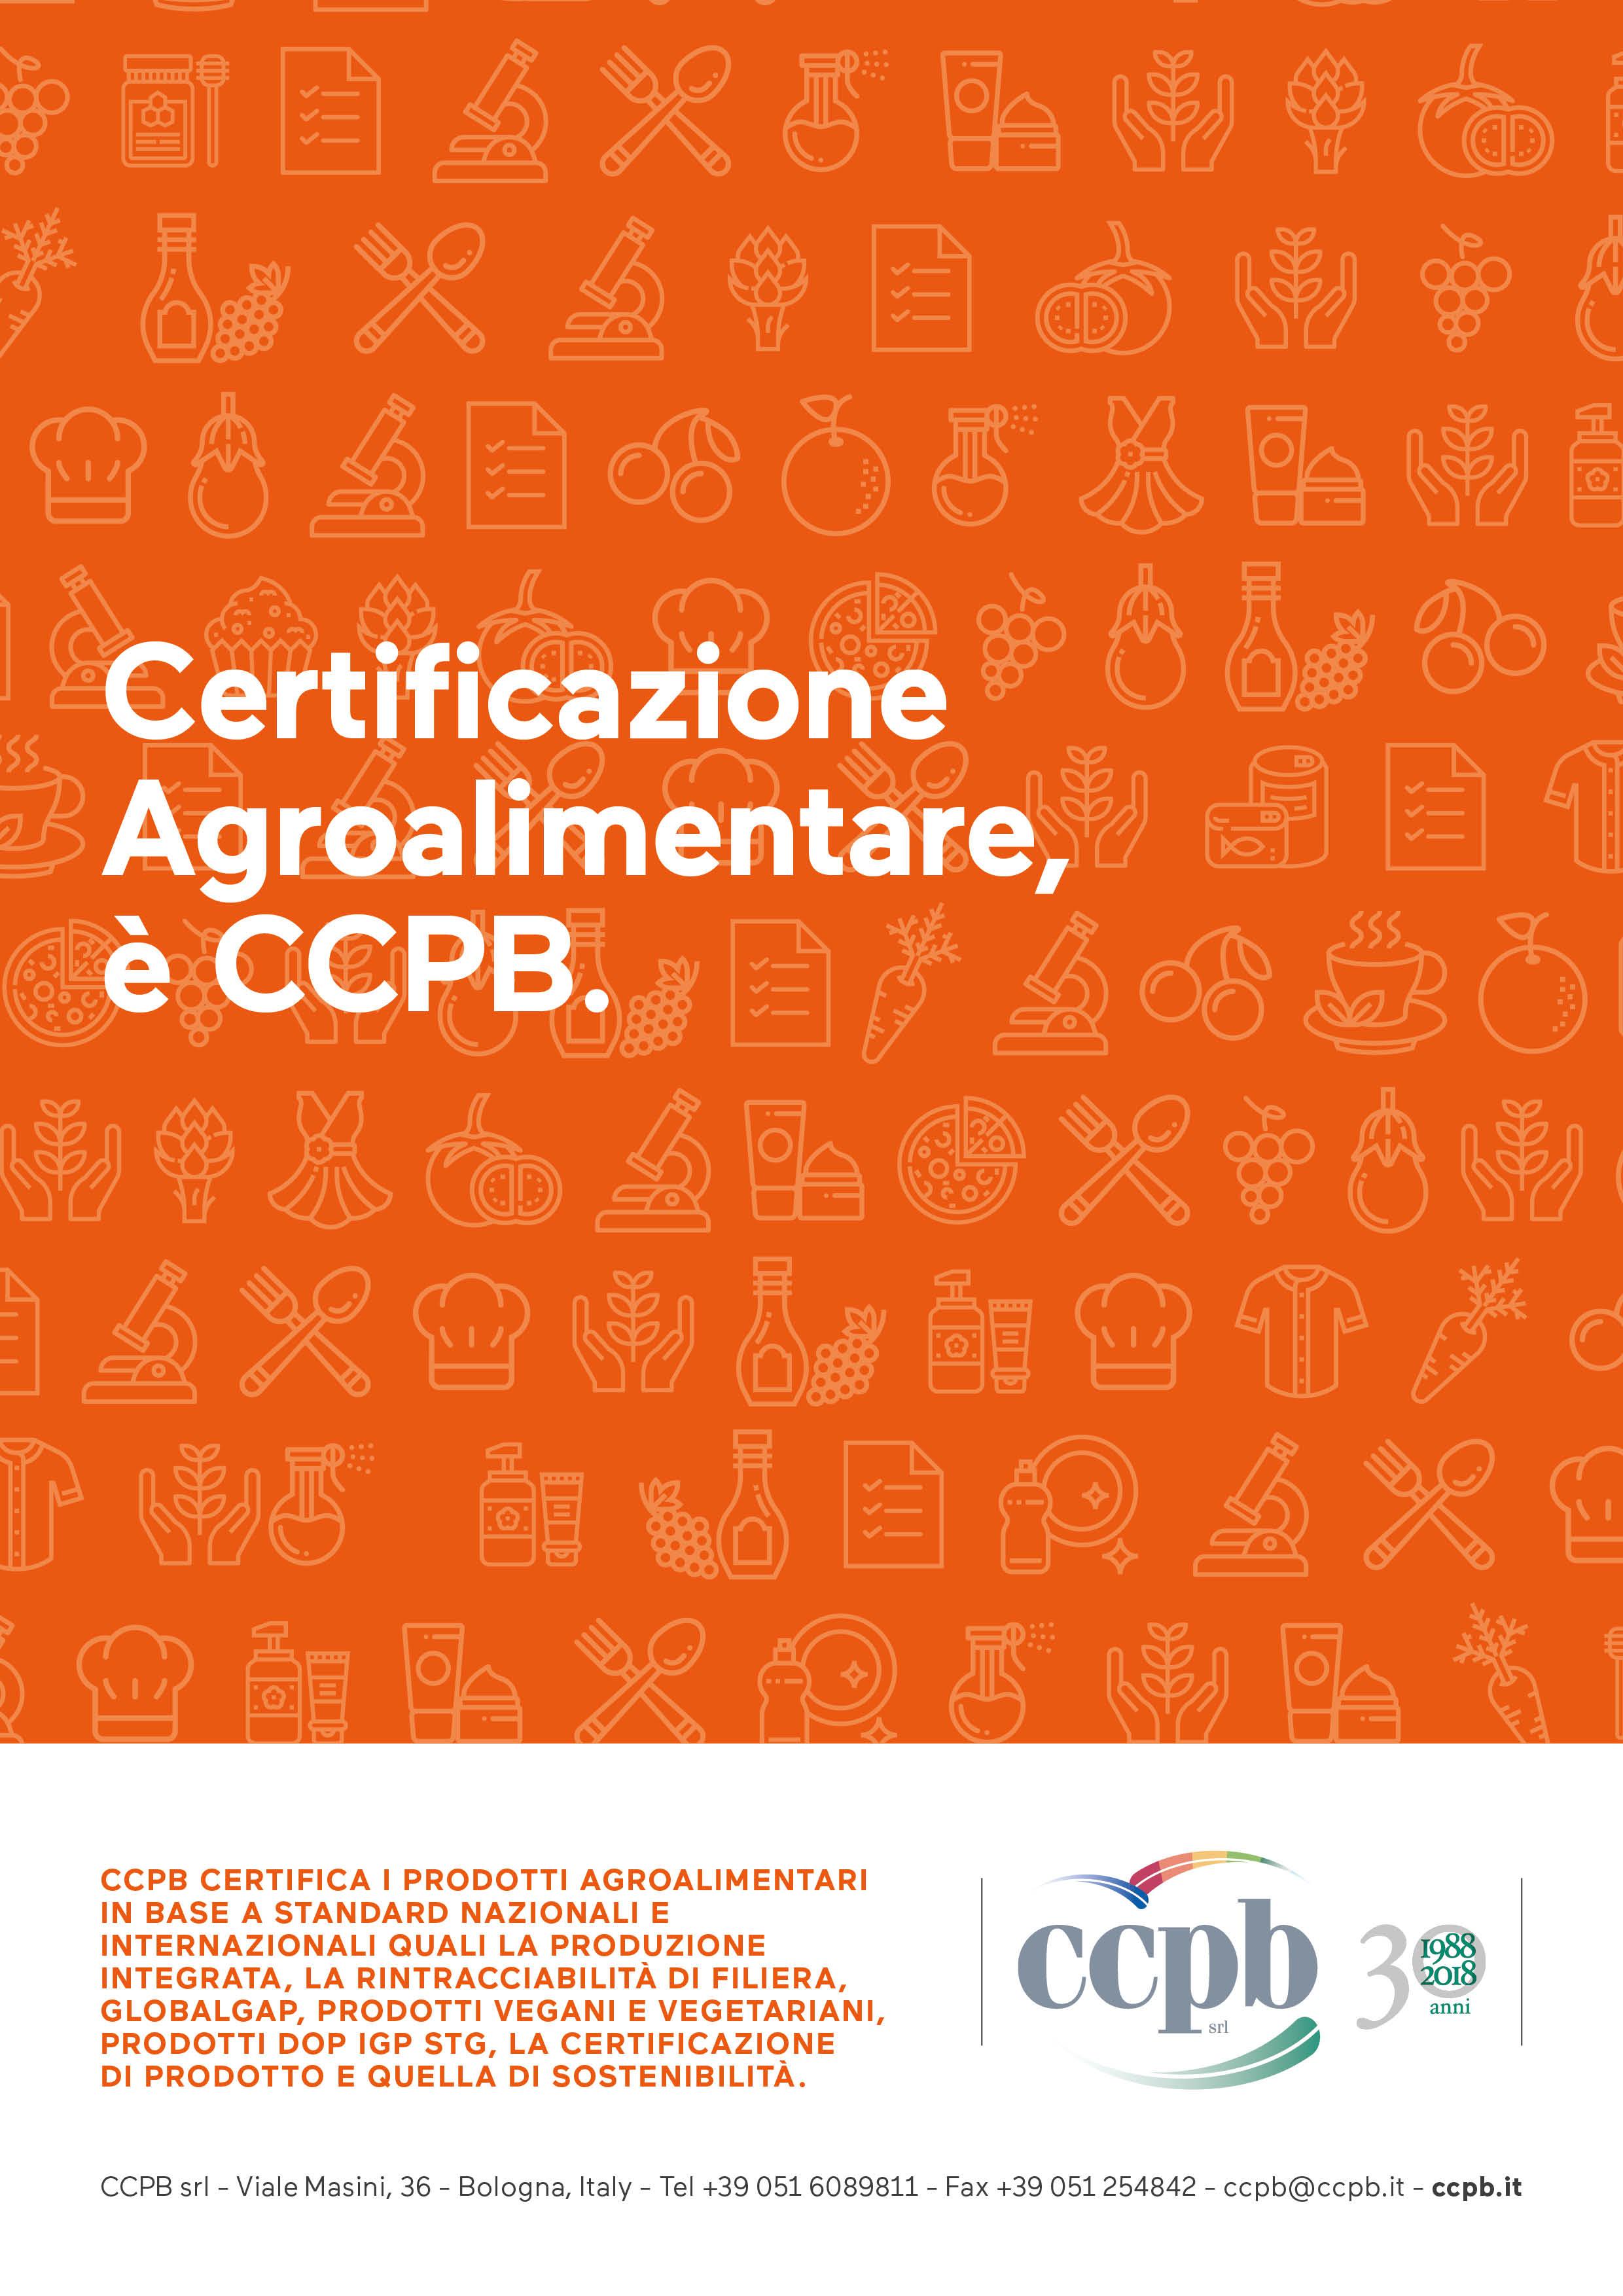 CCPB_A4-ITA_Agroalimentare